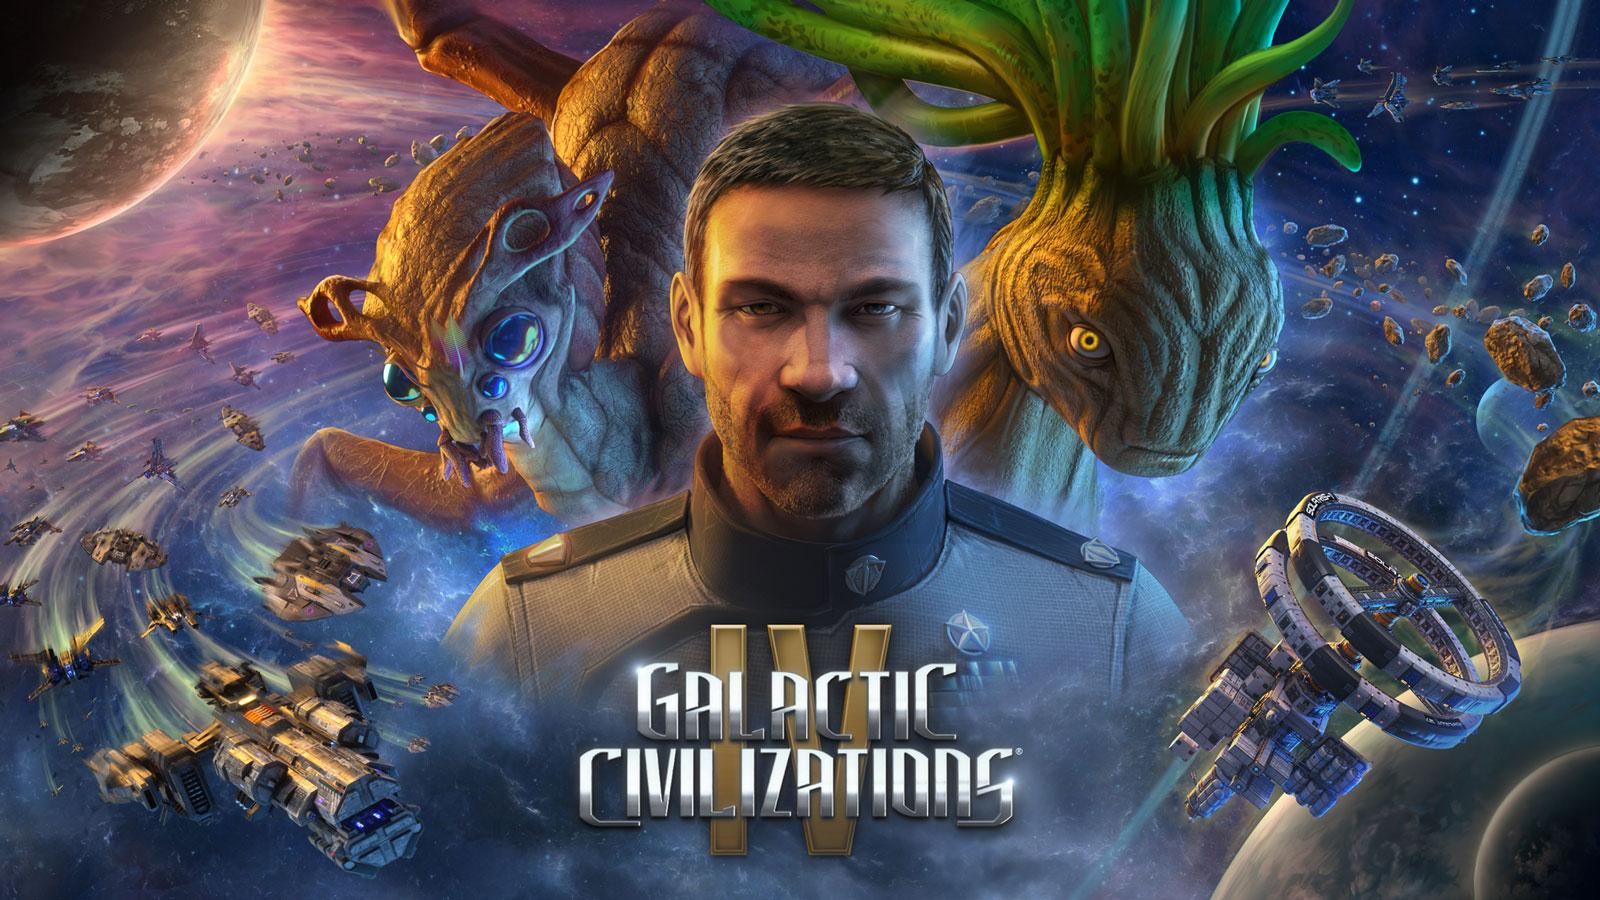 Free Galactic Civilizations IV Wallpaper in 1600x900